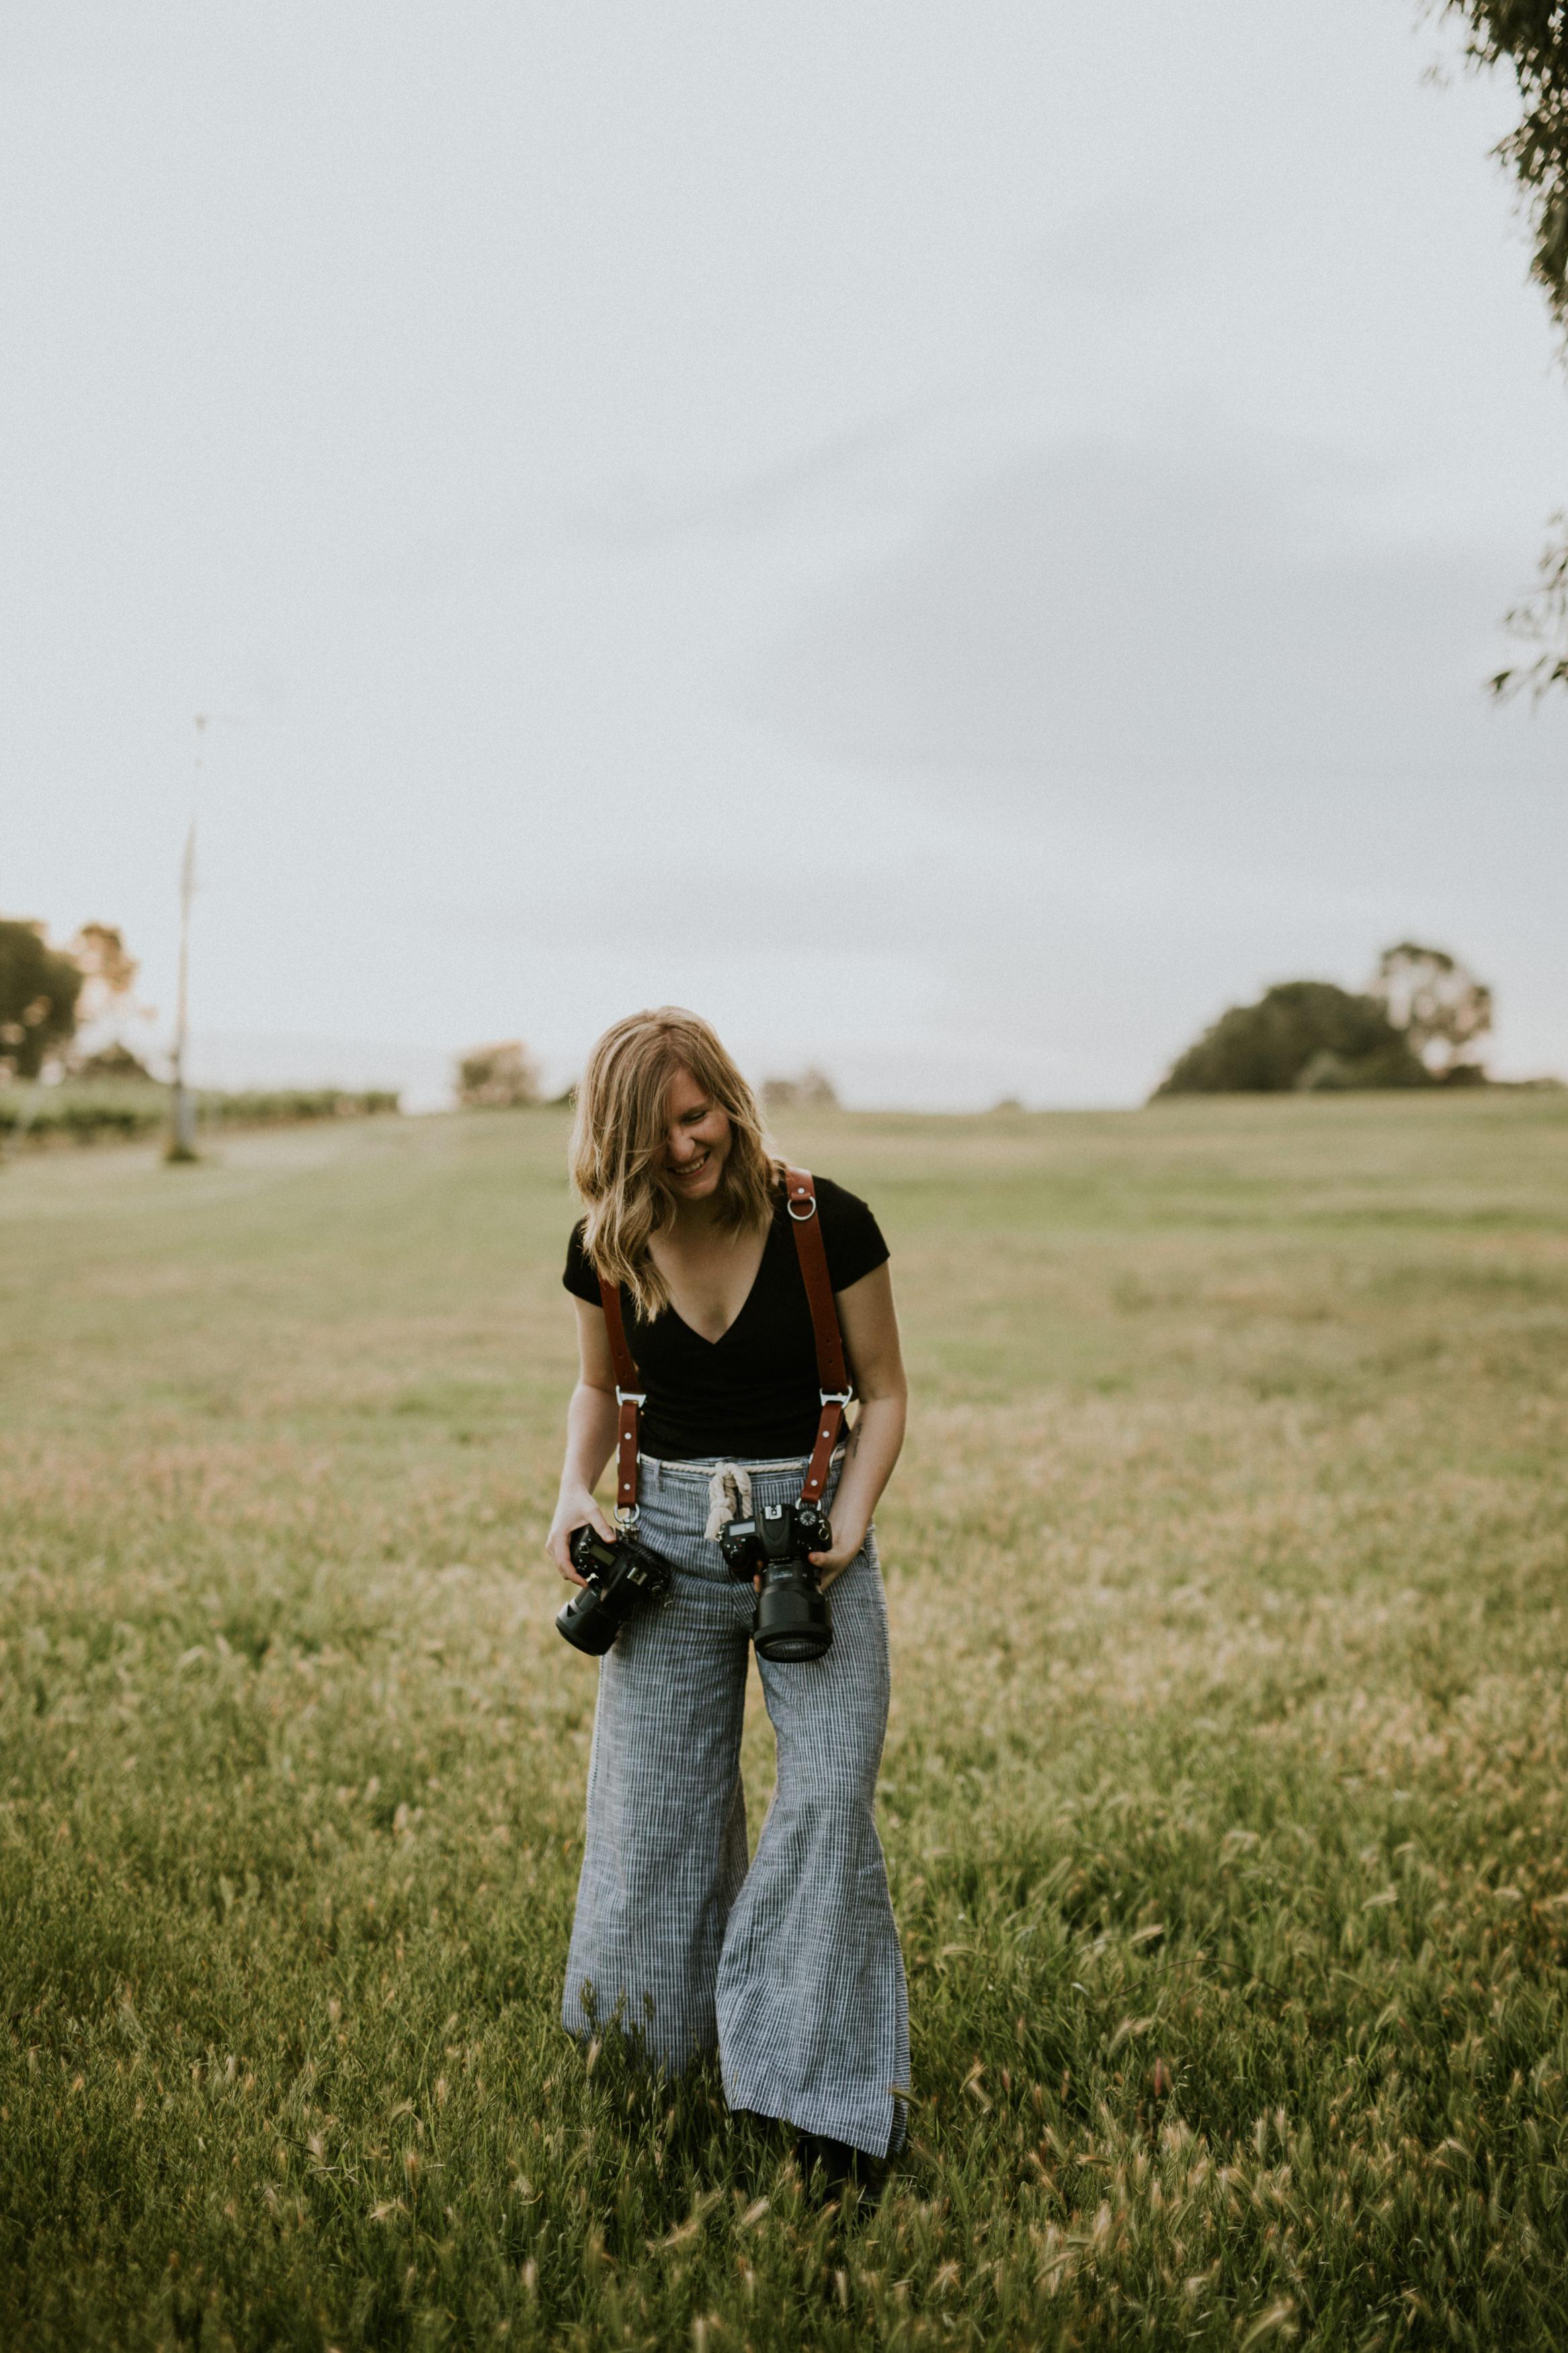 Images by Liz Jorquera Photography